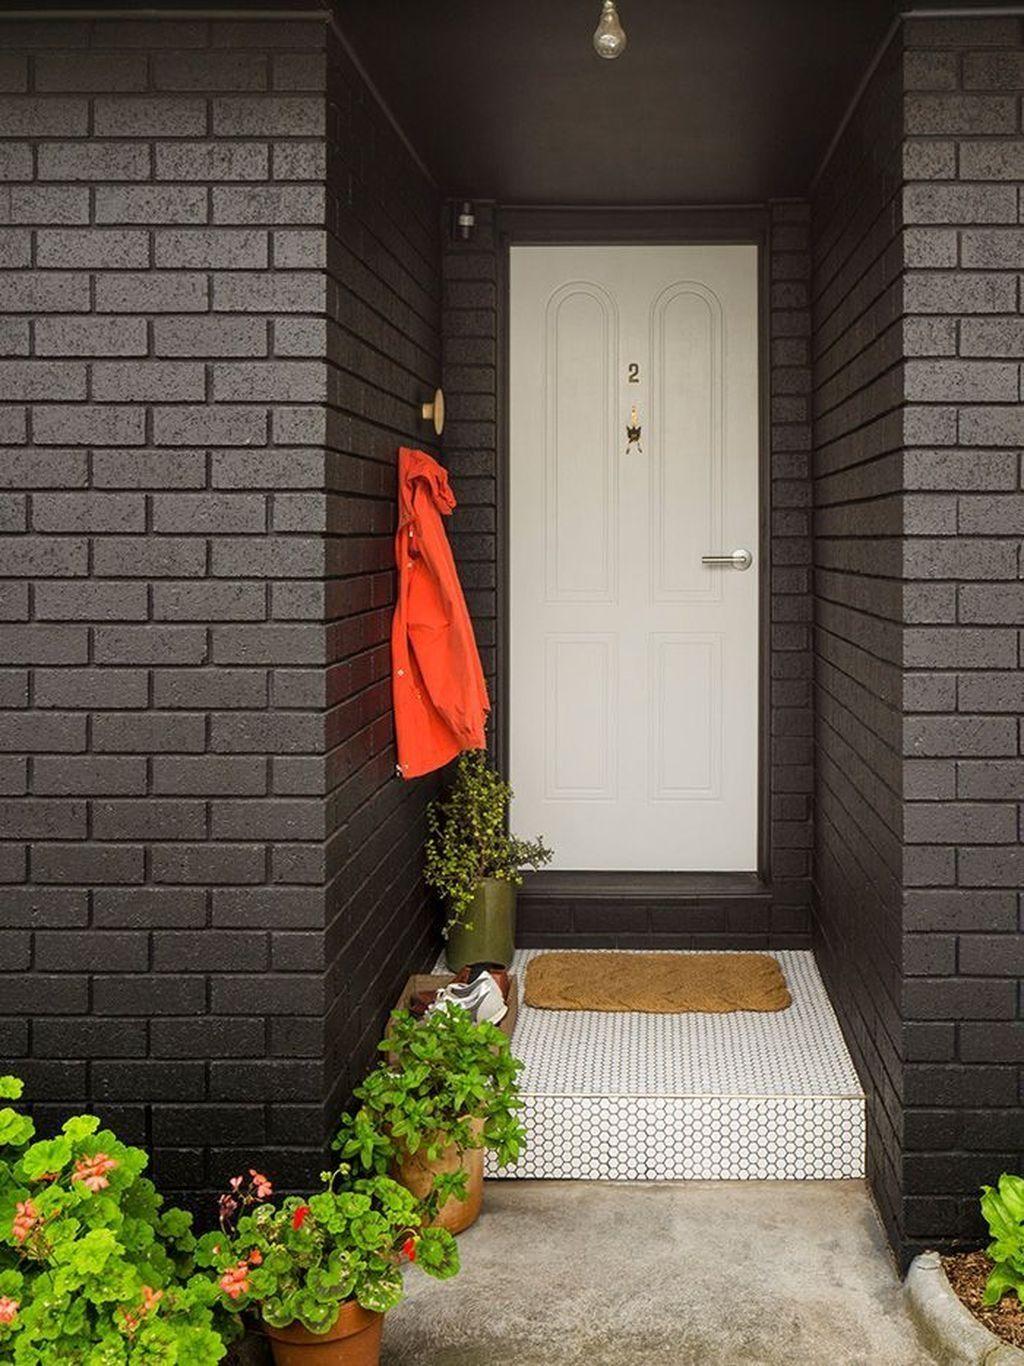 Awesome 20 Elegant Brick Exterior Designs Ideas Brick Exterior House Painted Brick House Painted Brick Exteriors